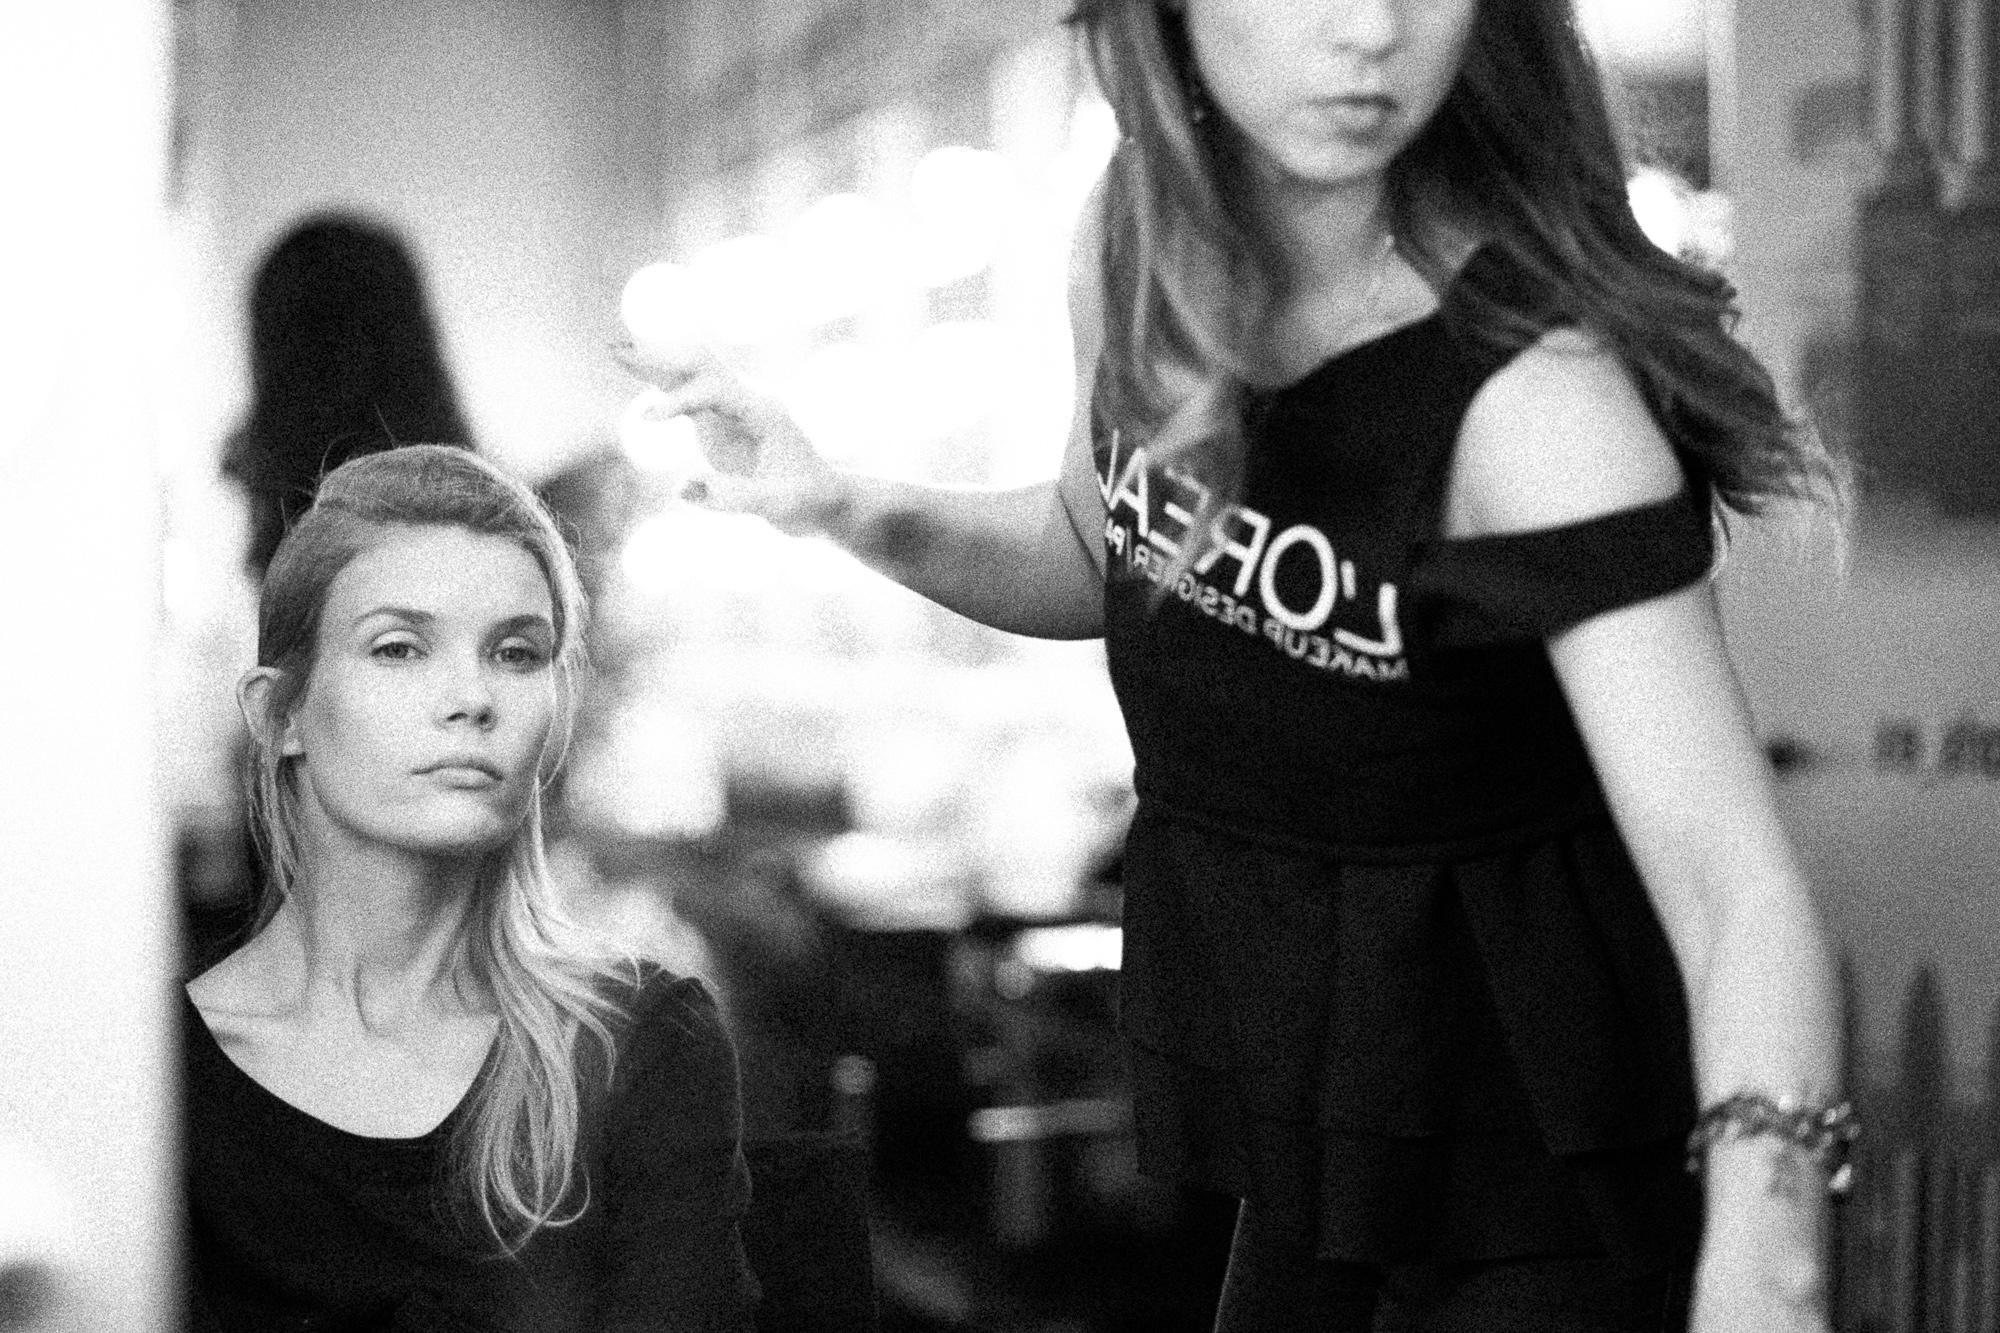 oscar-arribas-beauty-backstage-madrid-fashion-week-cibeles-photography-moda-desfile-fotografo-photographer-portrait-retrato-13__MG_5904.jpg